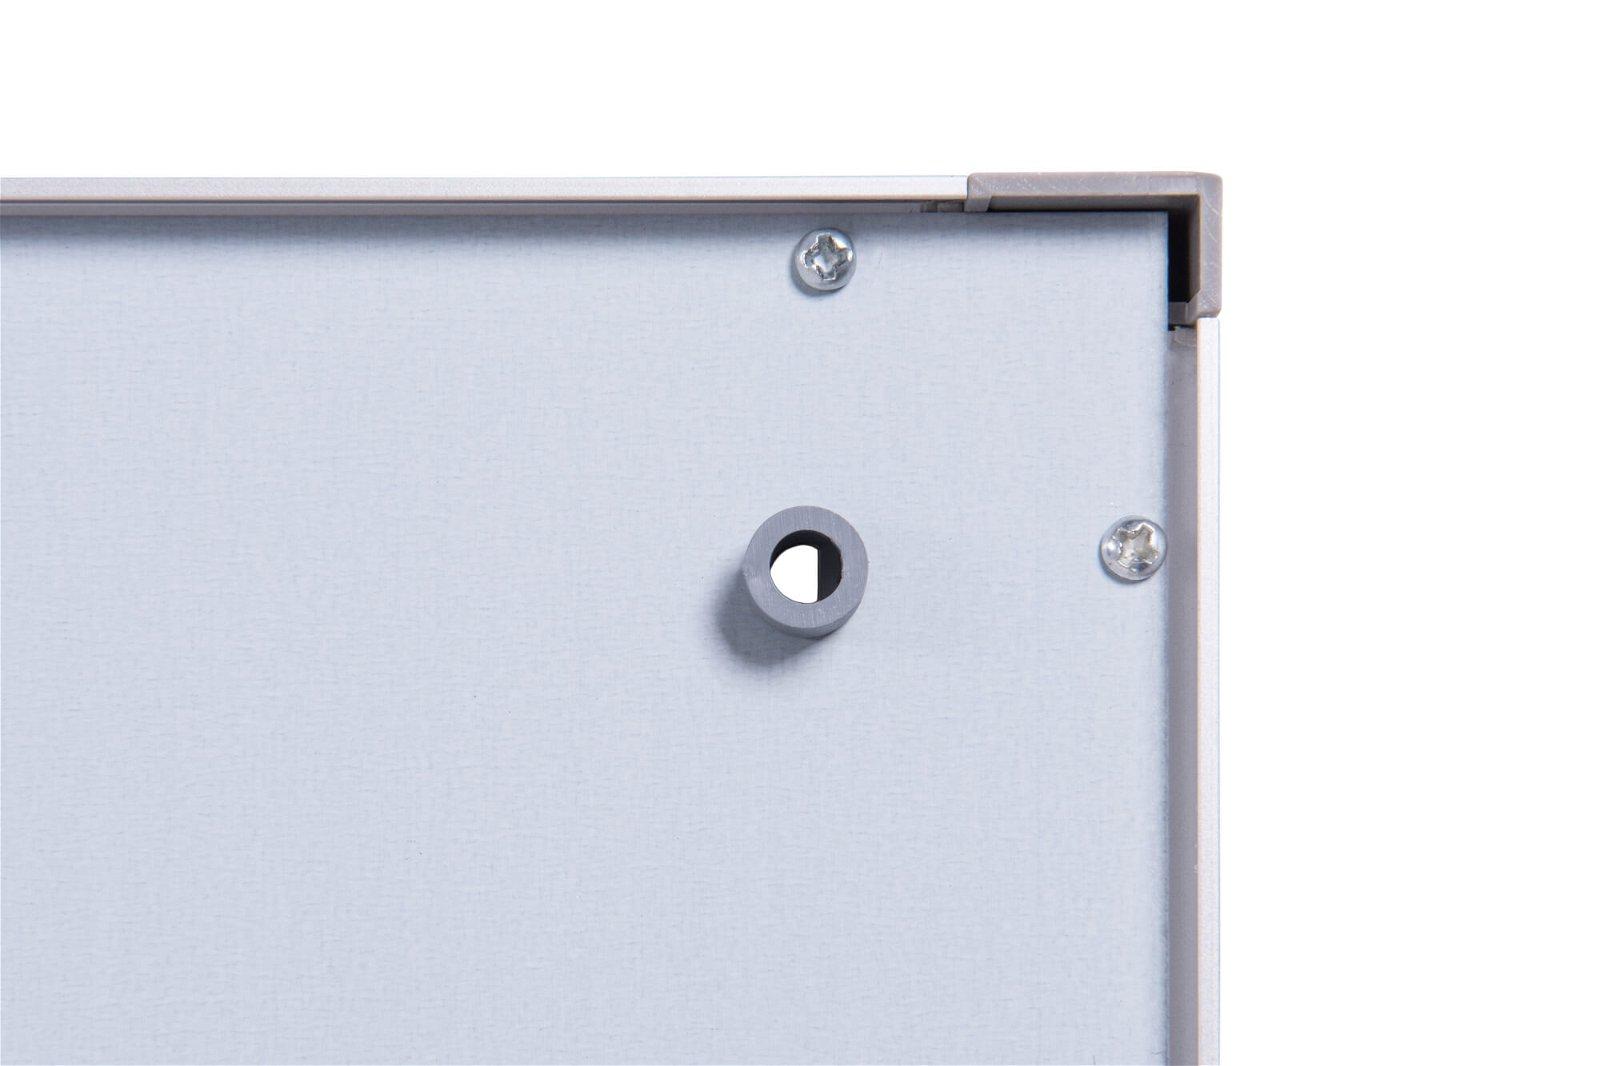 Schaukasten MAULextraslim, 6 x A4, aluminium